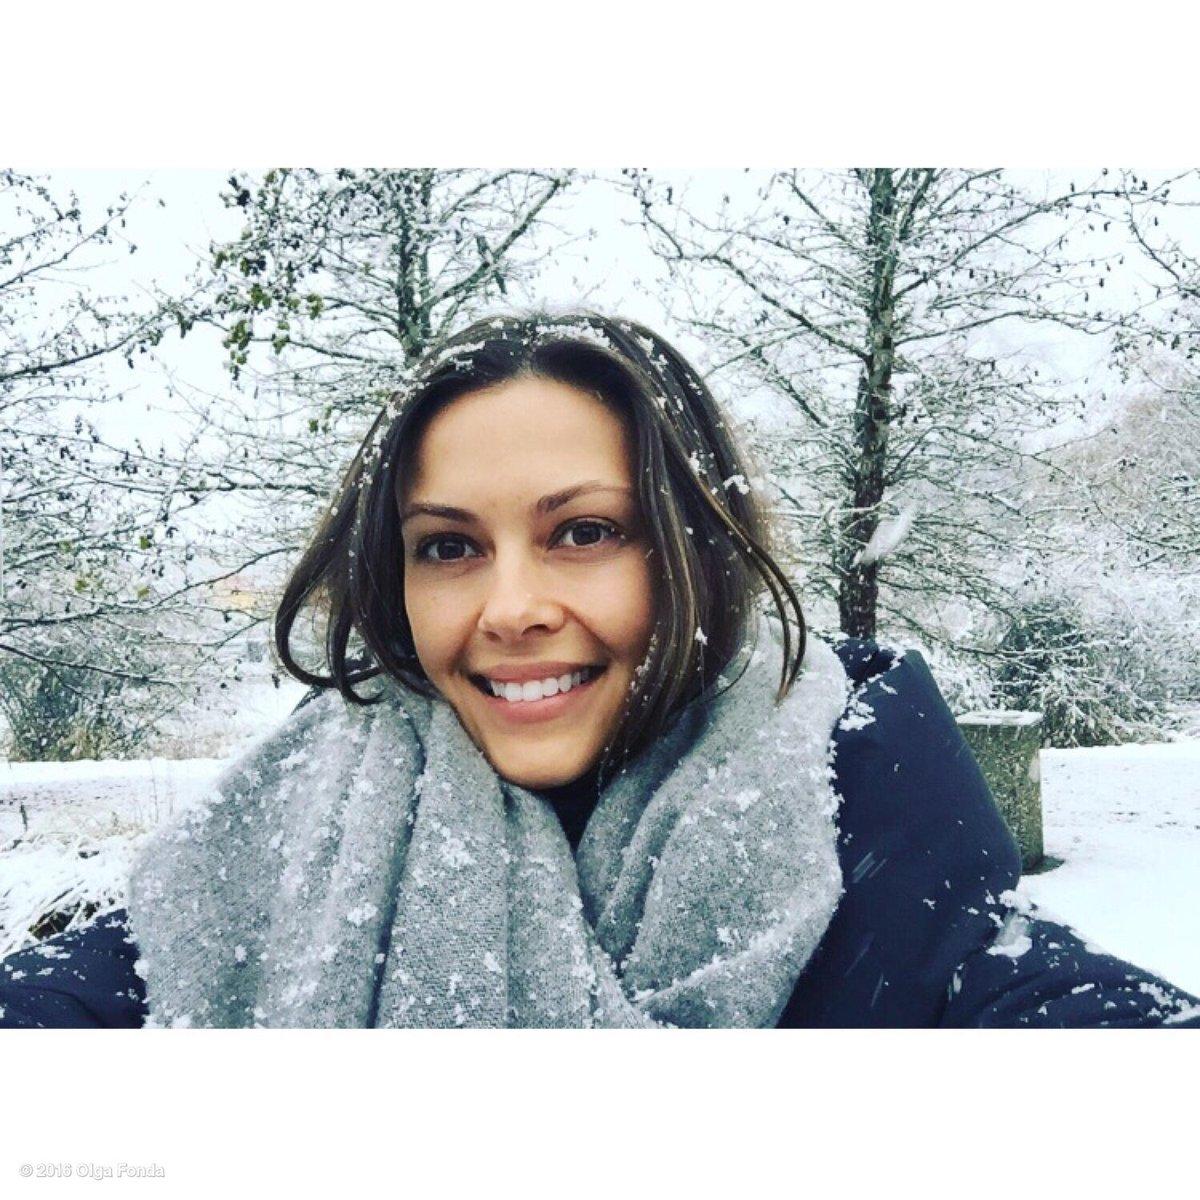 Olga Snow pic 78